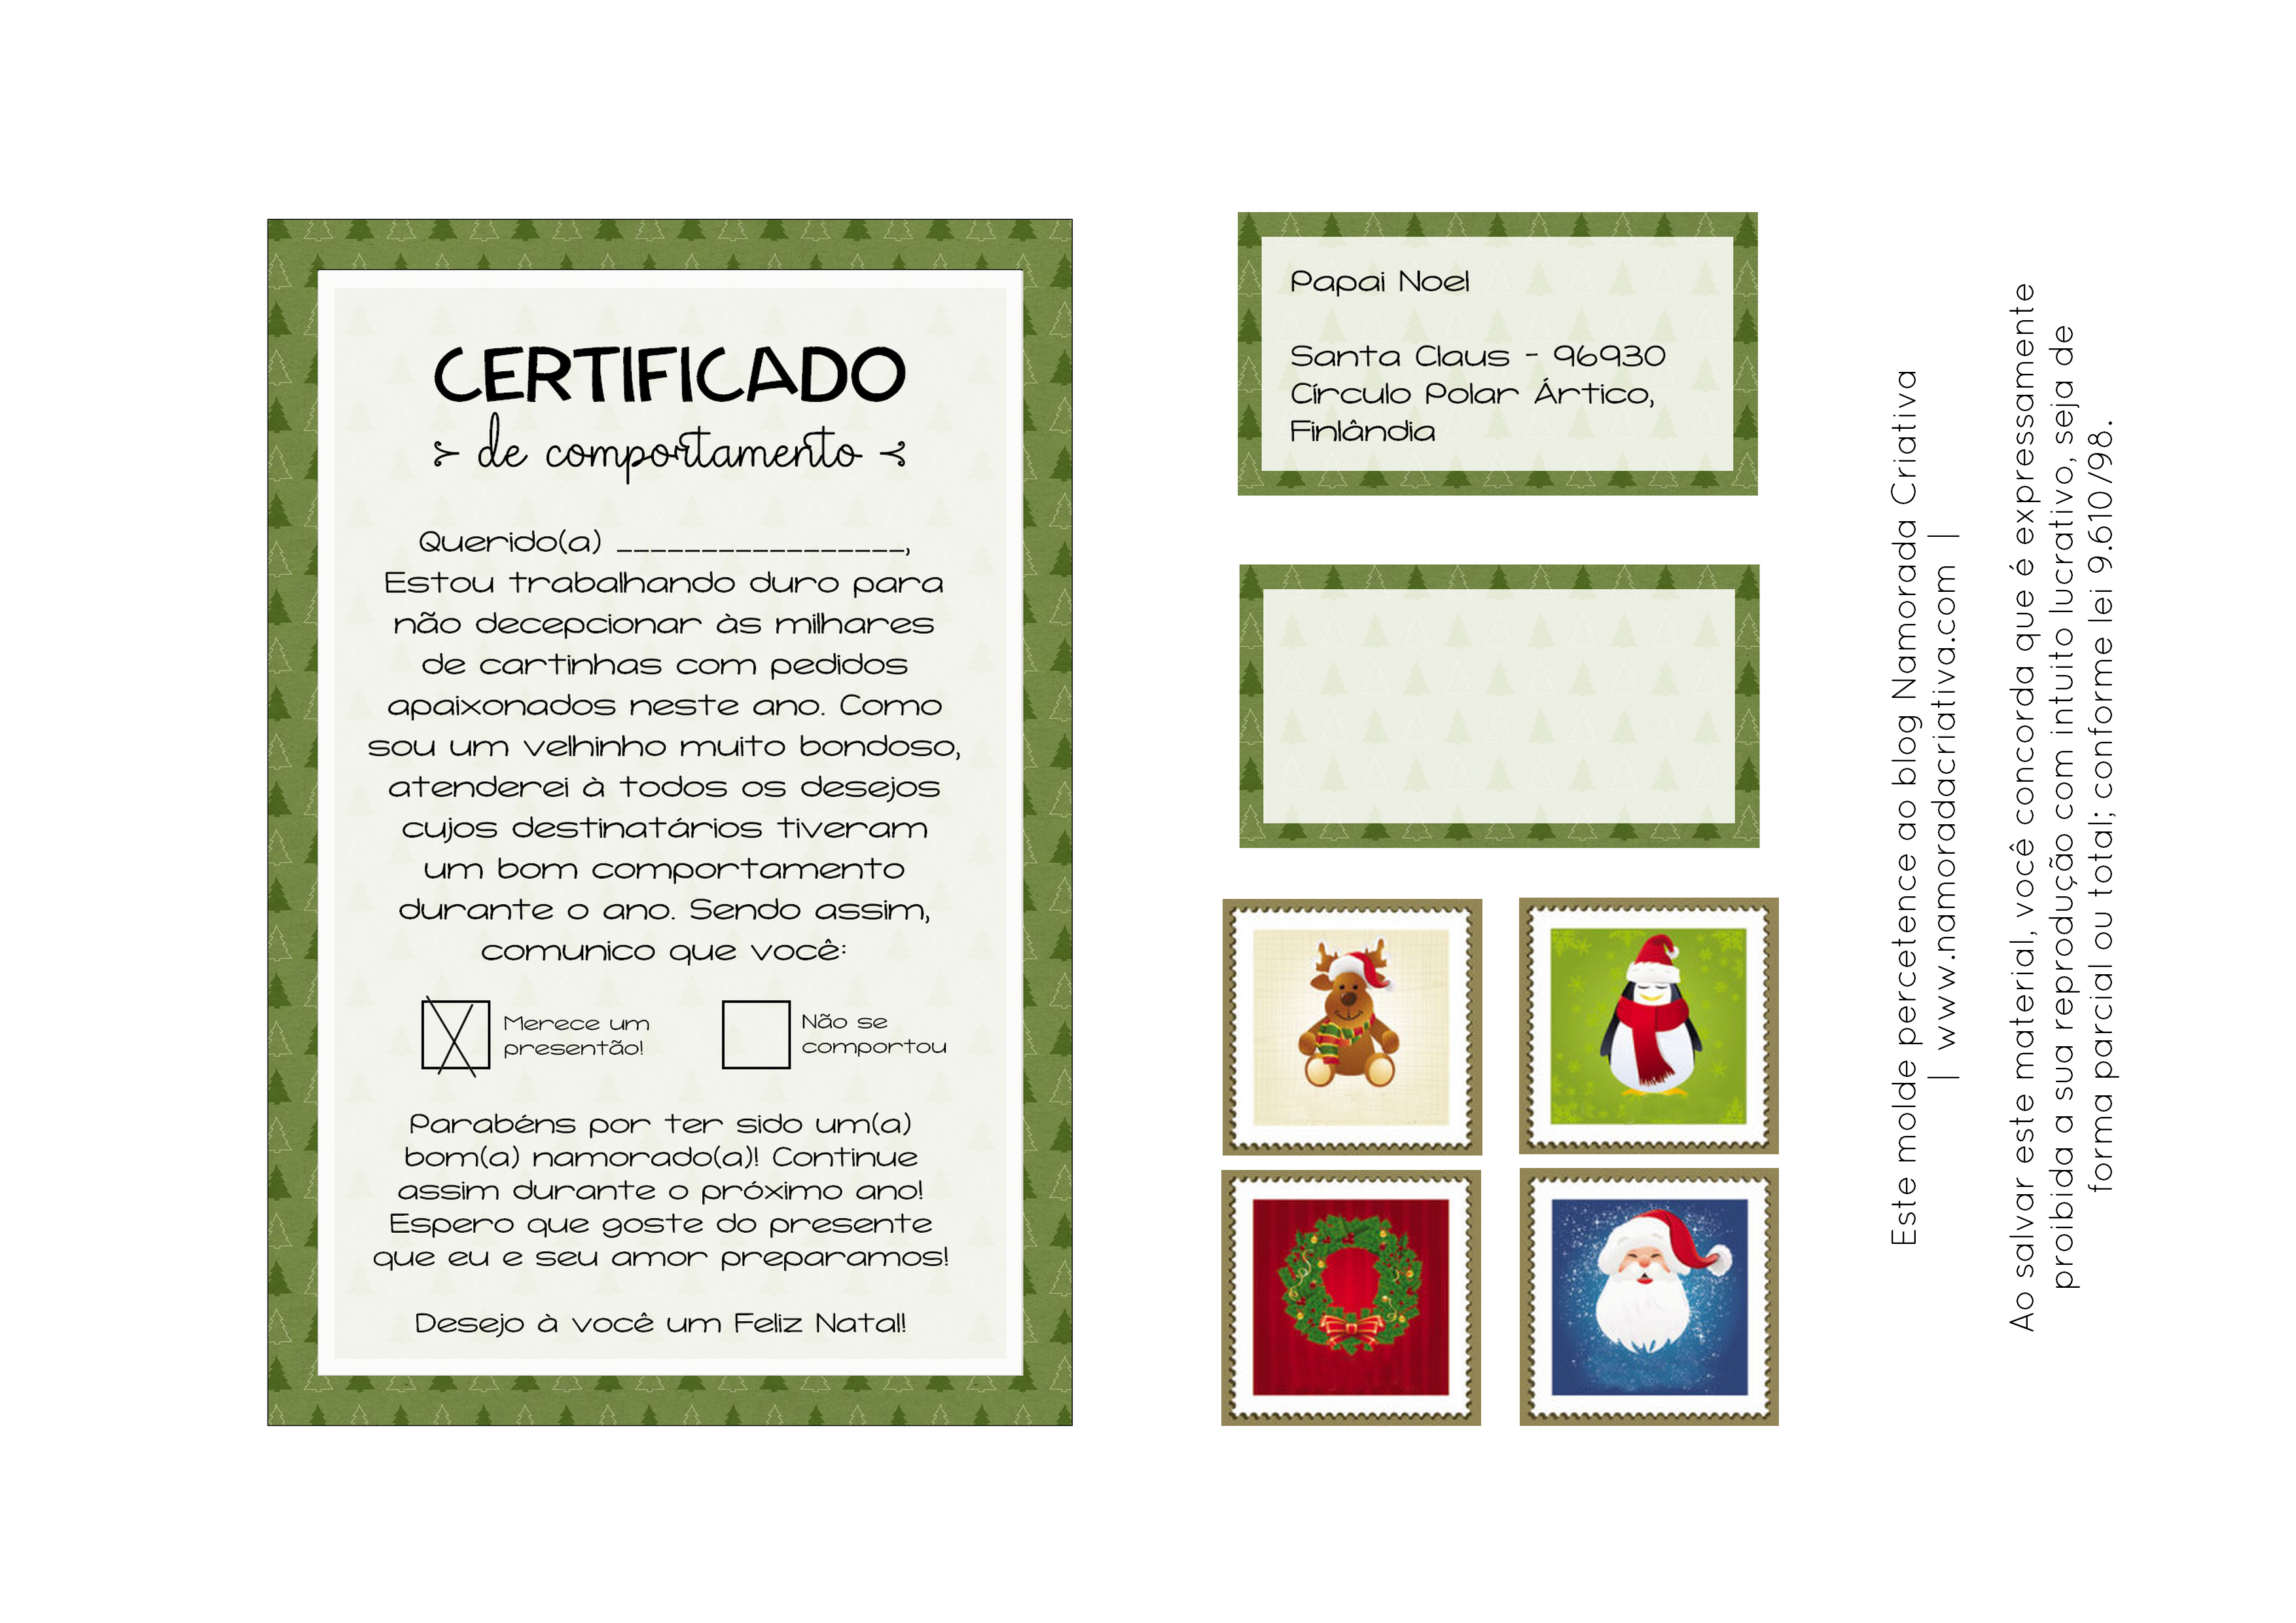 DIY NATAL - CERTIFICADO DE COMPORTAMENTO - BLOG NAMORADA CRIATIVA - APROVADO